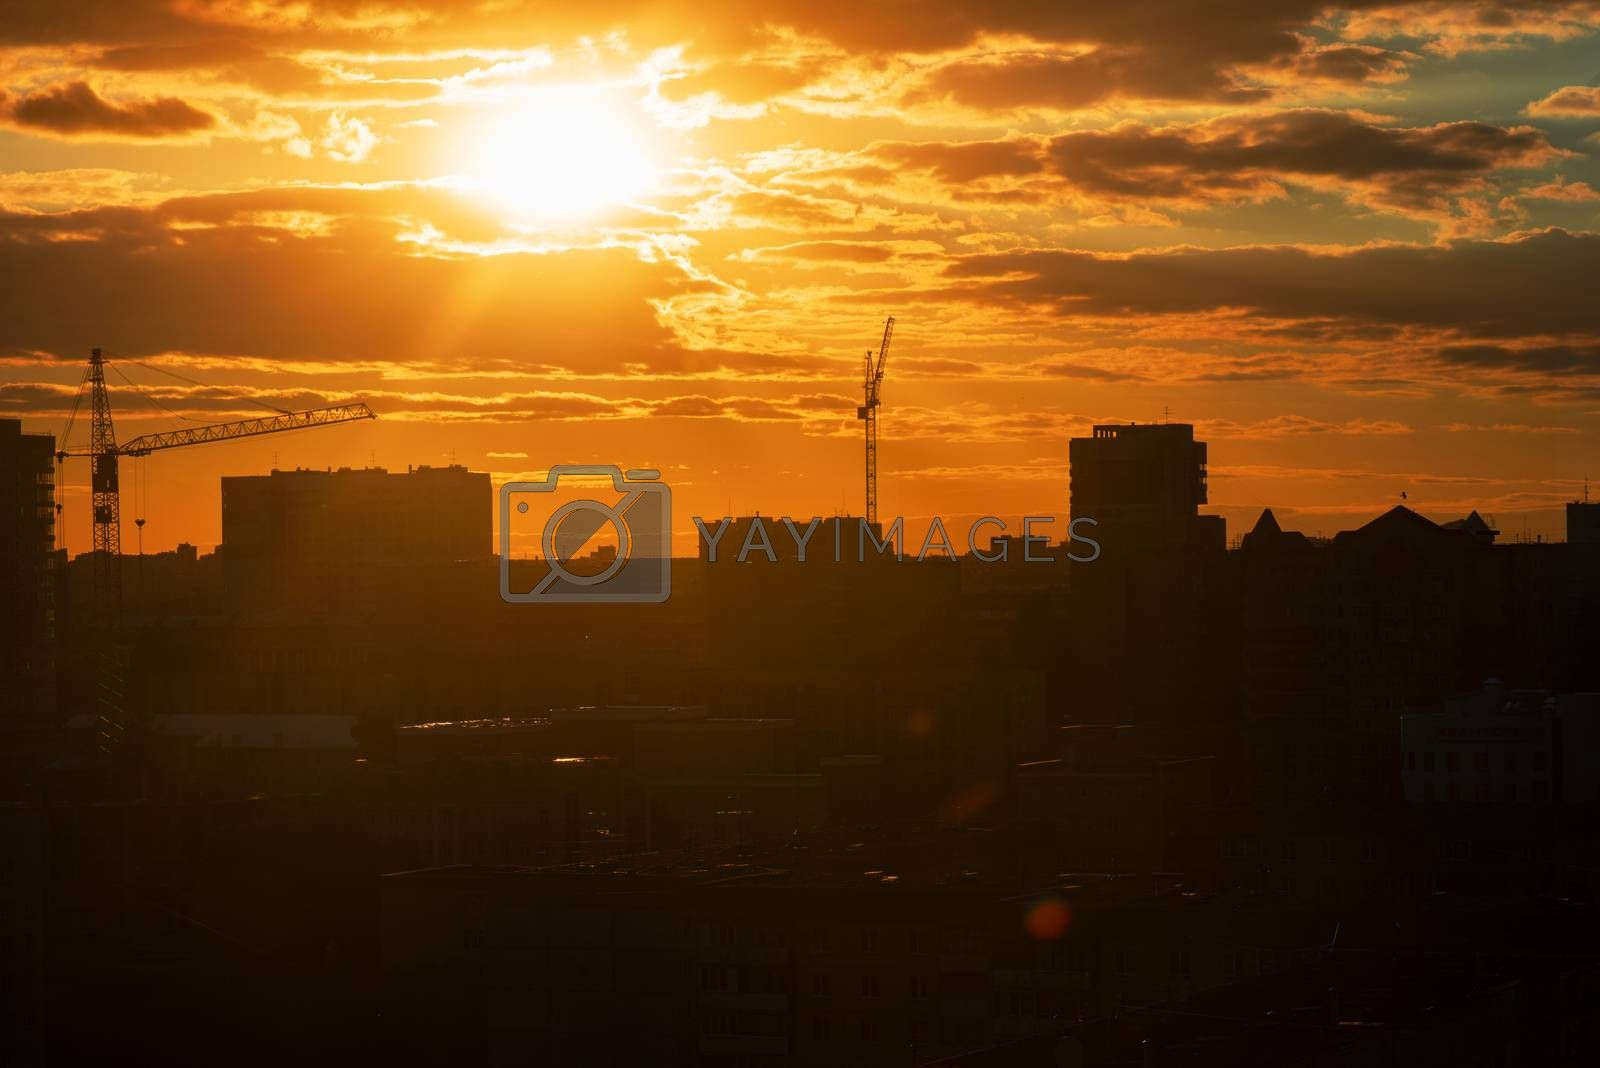 Evening photo of city, beauty summer sunset